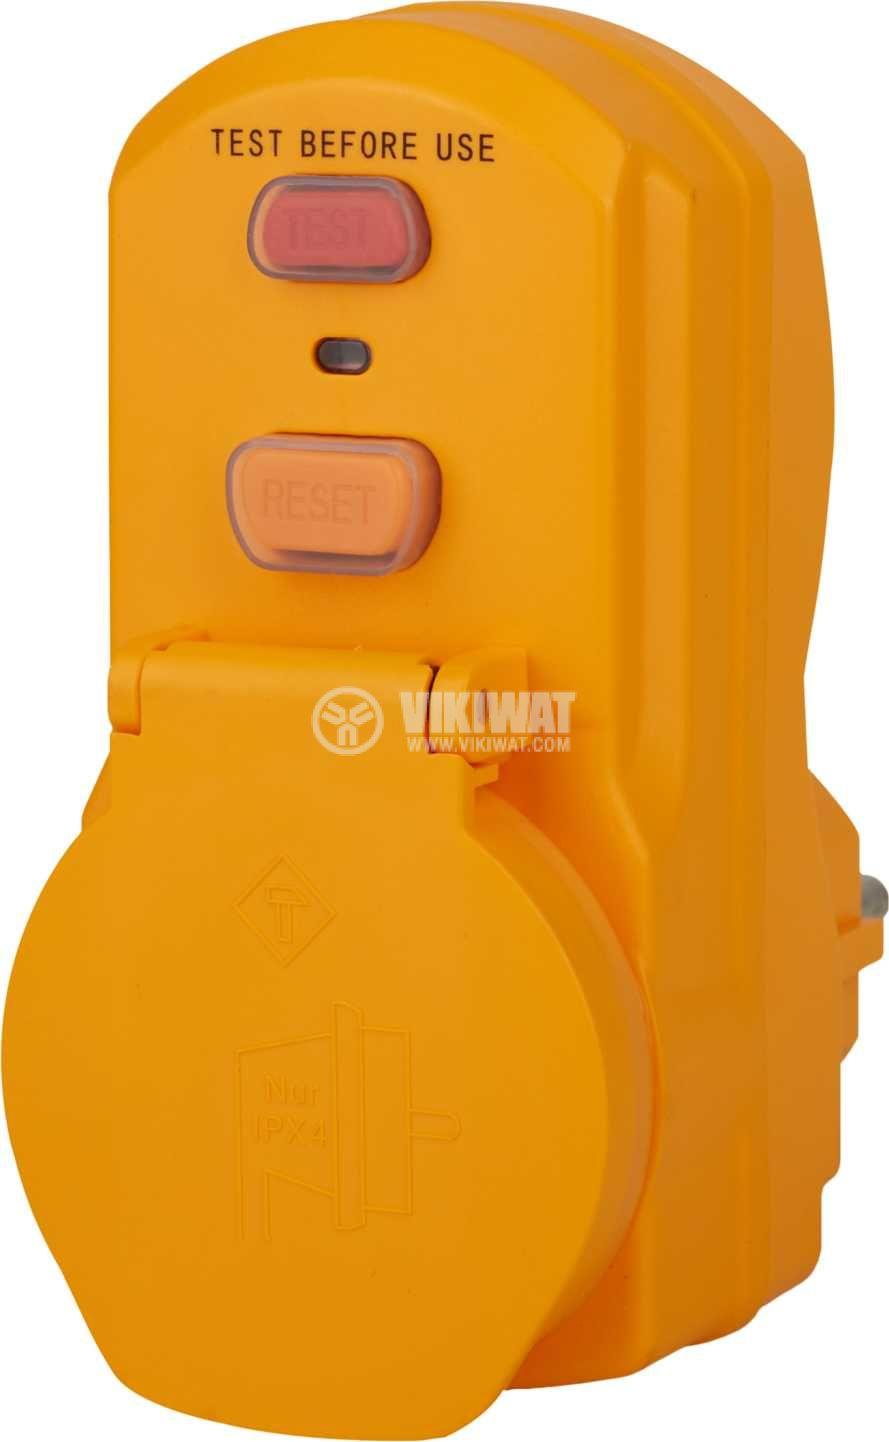 Circuit breaker adapter, brennenstuhl, BDI-A 2 30, 16A, IP54, 1290660 - 1